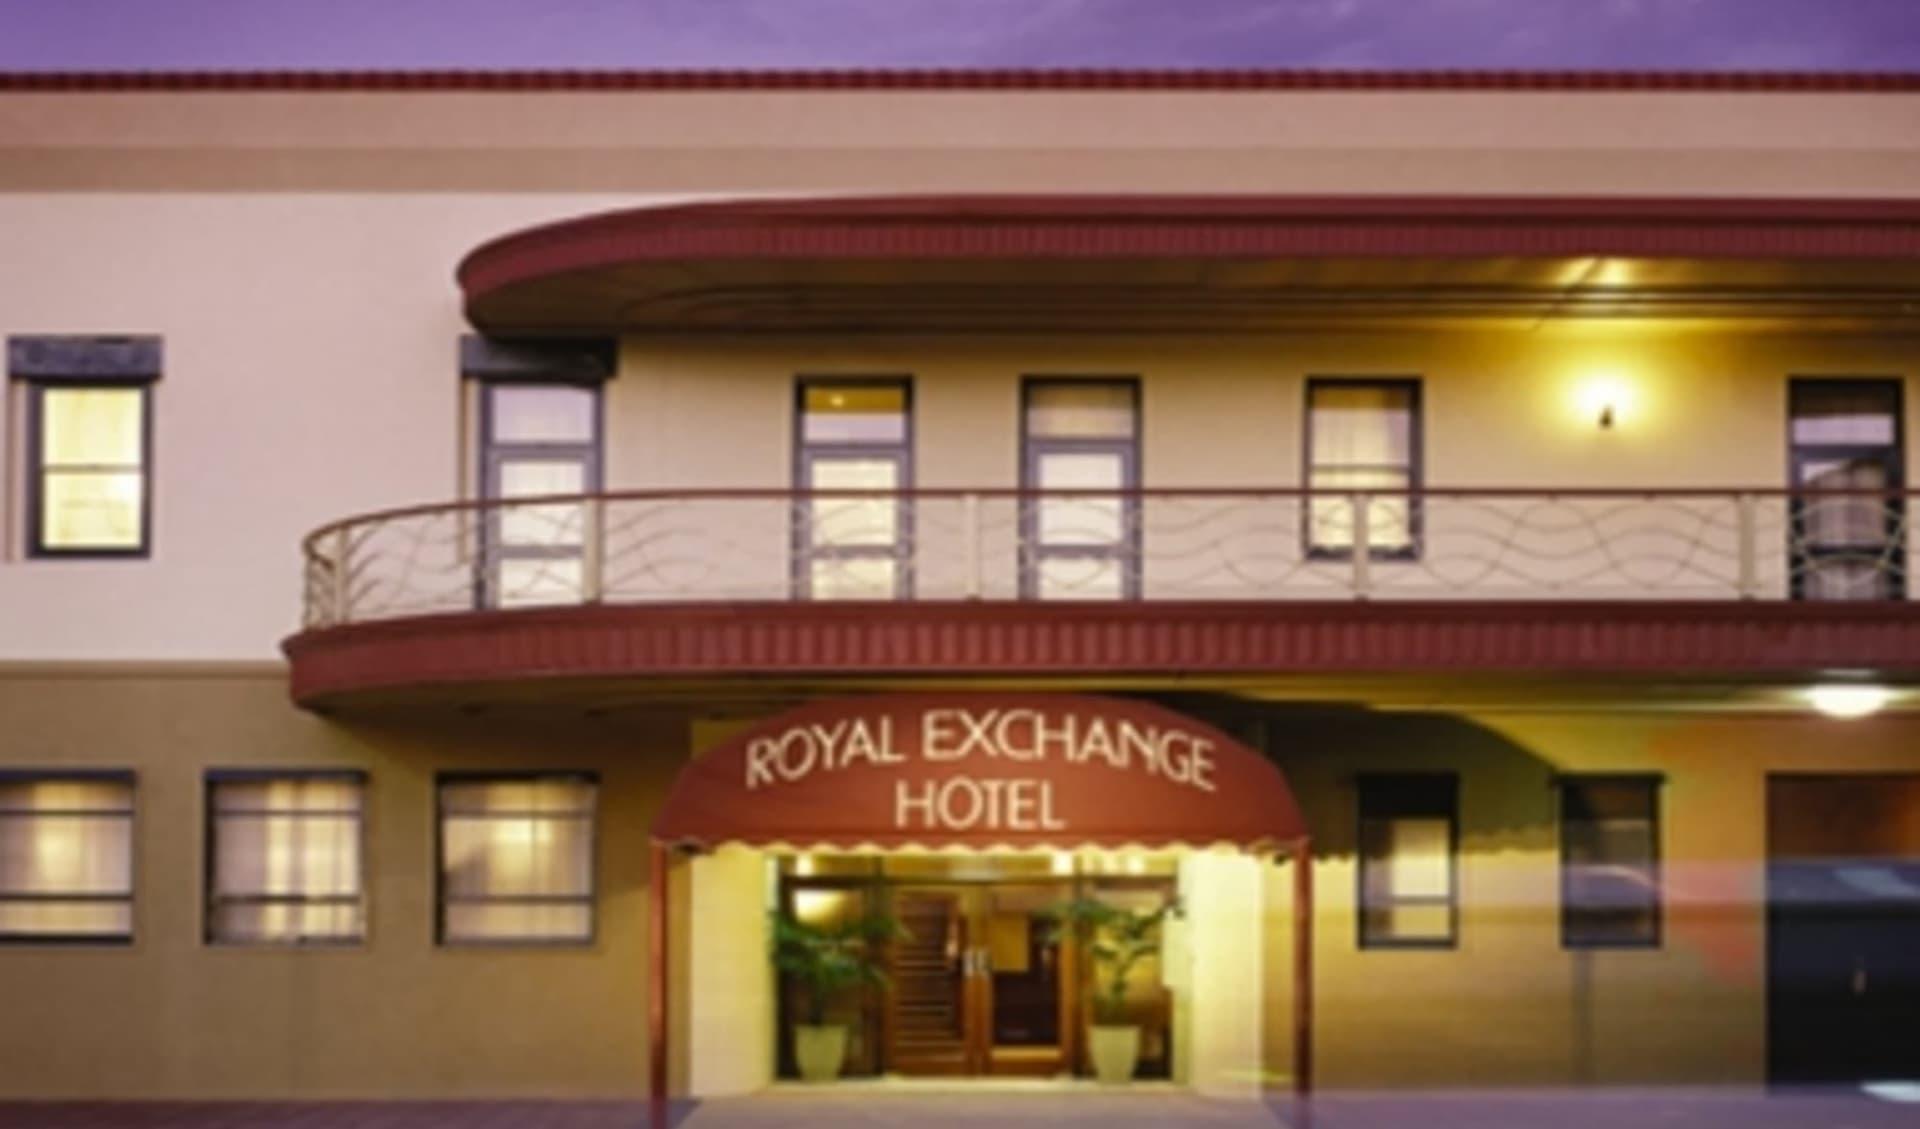 Royal Exchange Boutique Hotel in Broken Hill:  Royal Exchange Broken Hill